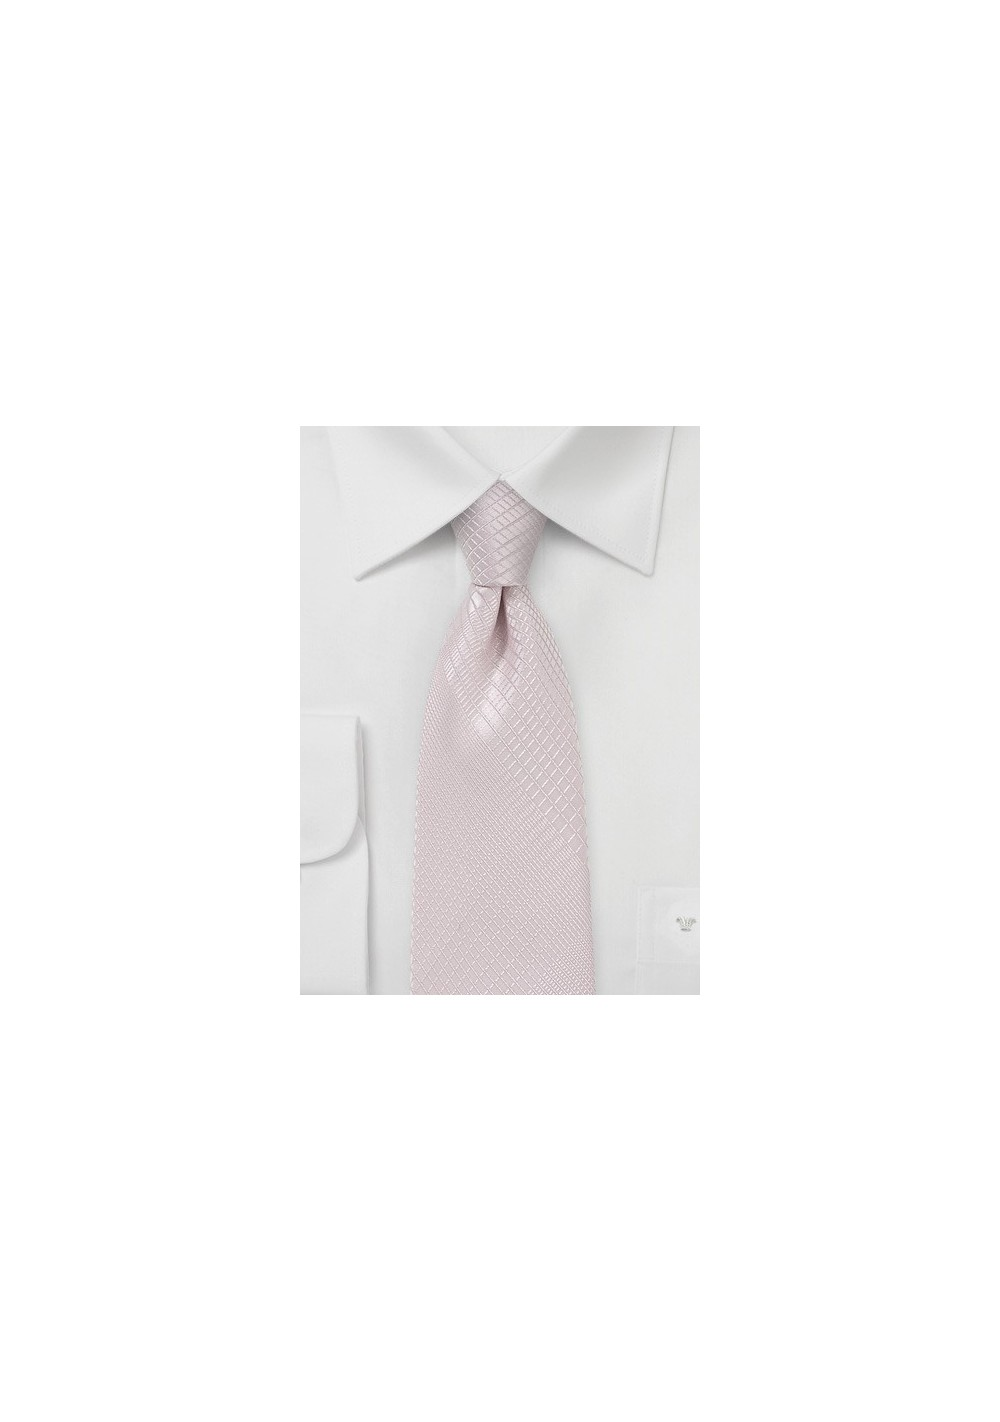 Soft Blush Hued Plaid Necktie